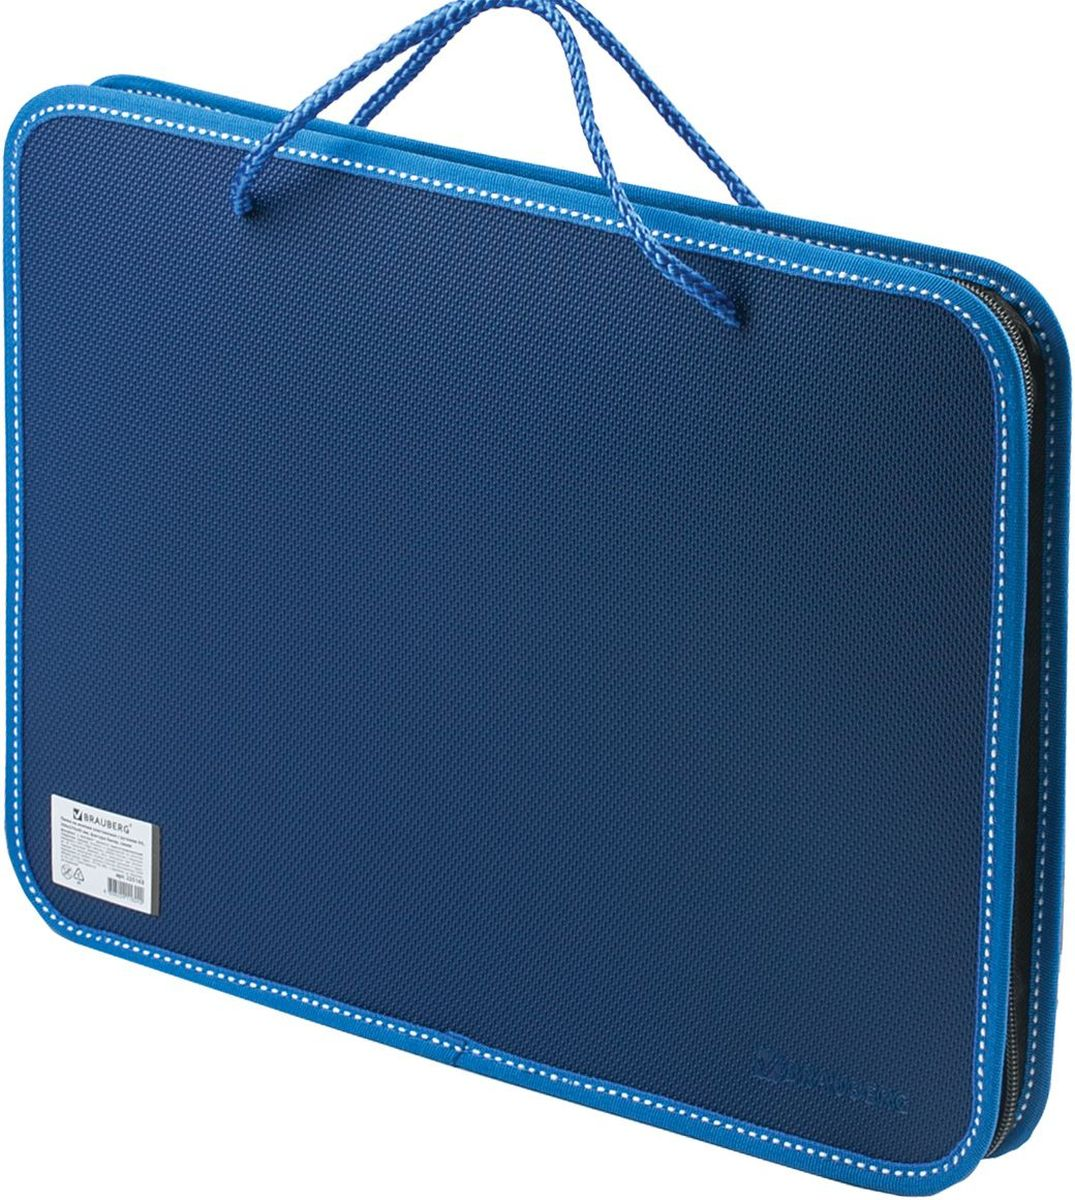 Brauberg Сумка-папка цвет синий brauberg папка для тетрадей футбол